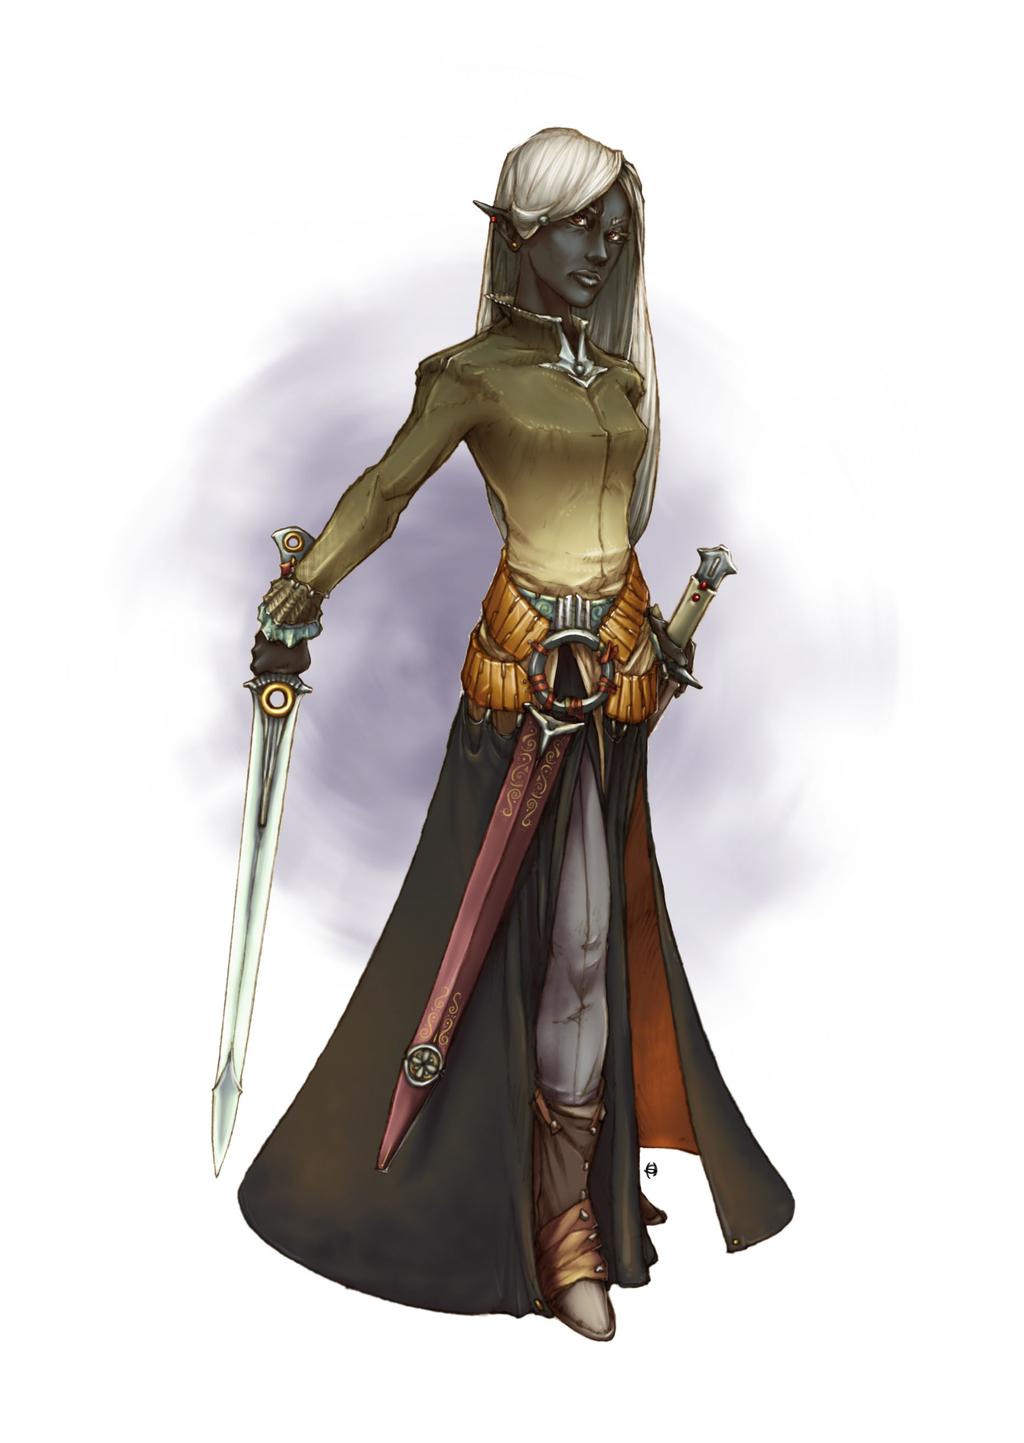 Most recent image: Lady Valana's Plan